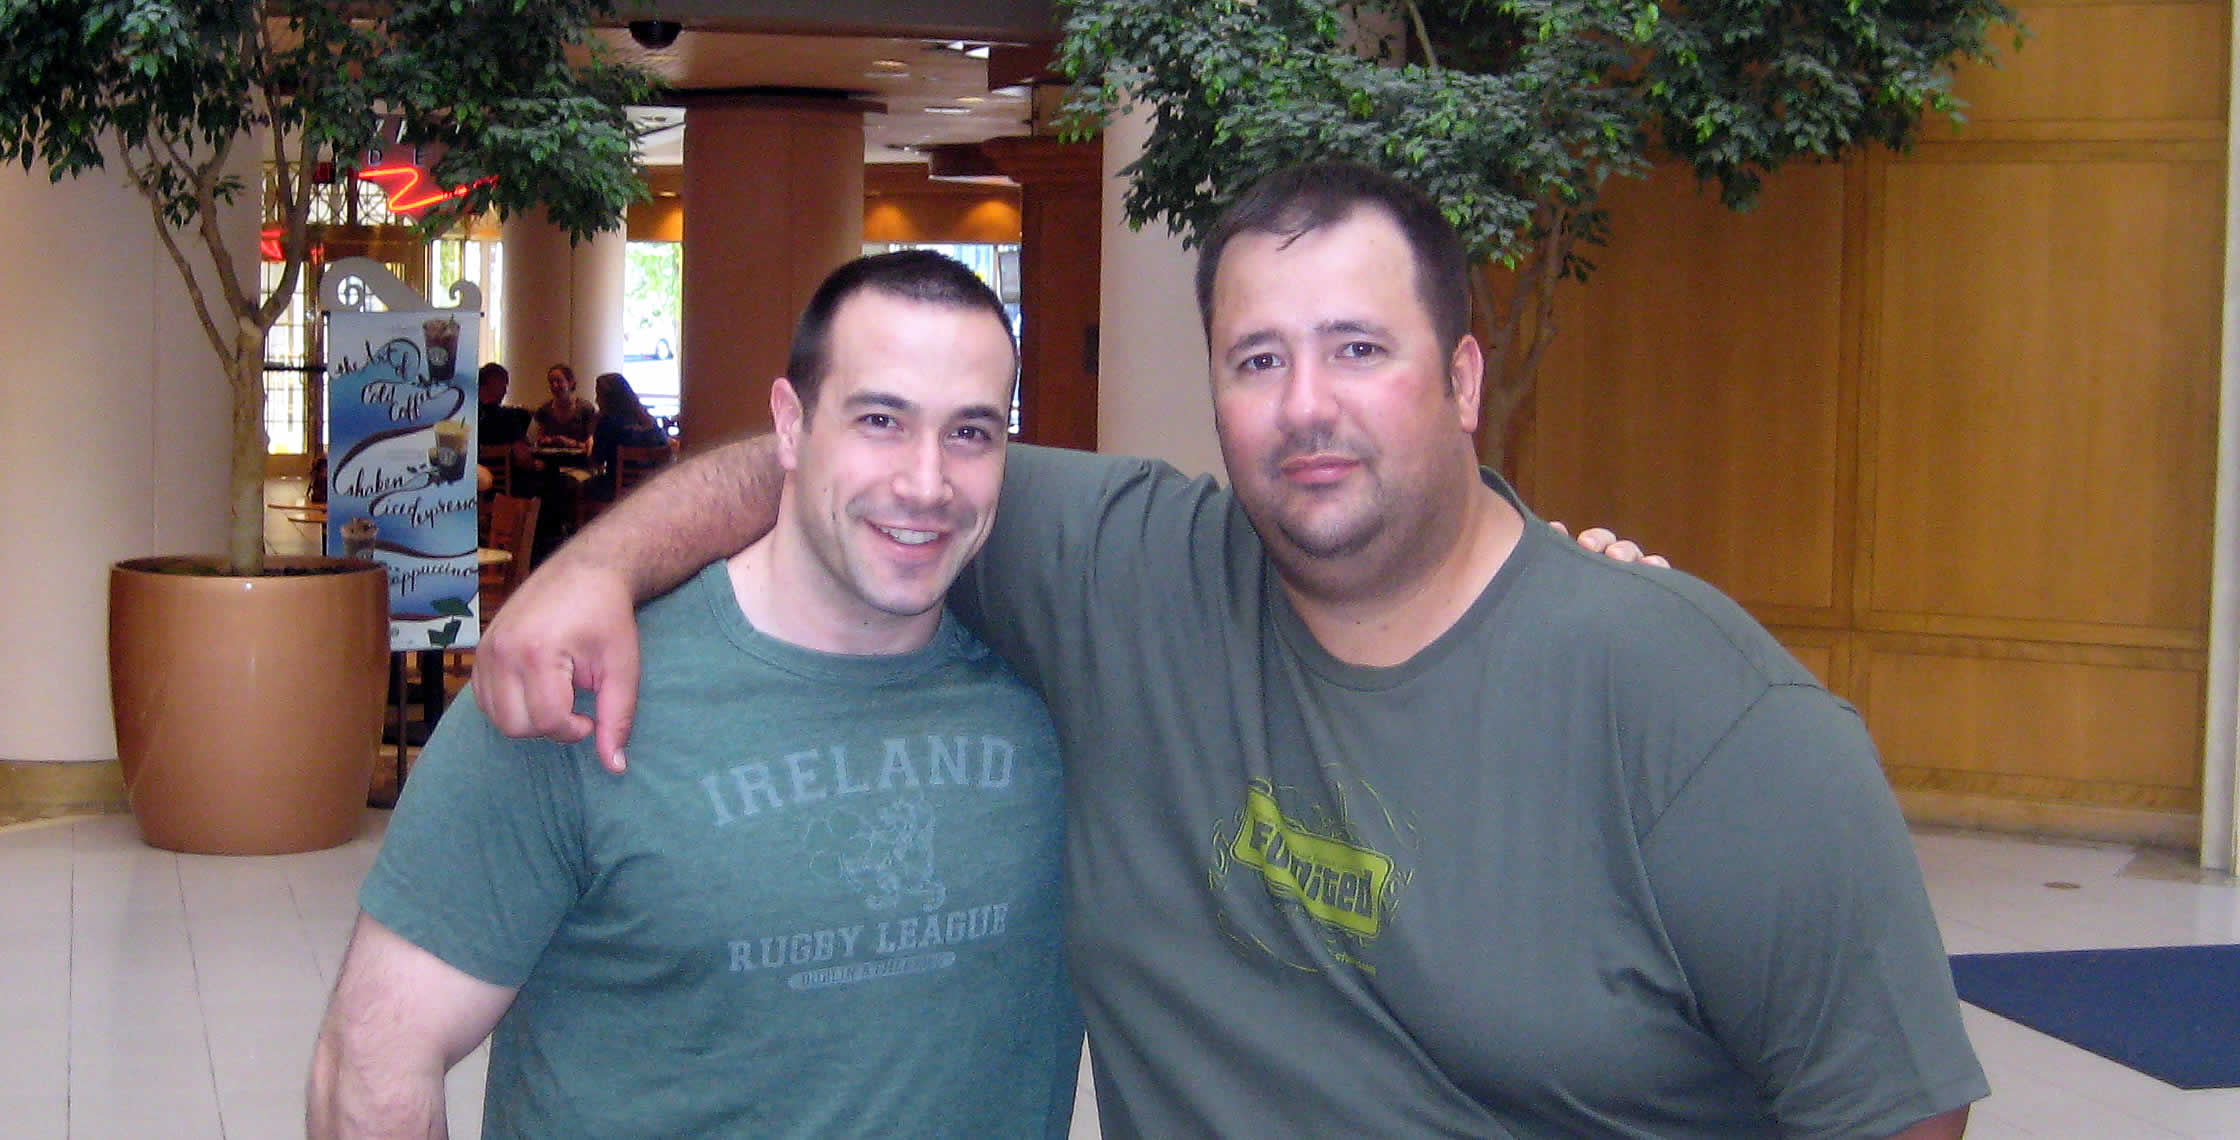 Ben Nadel at CFUNITED 2008 (Washington, D.C.) with: Phill Nacelli